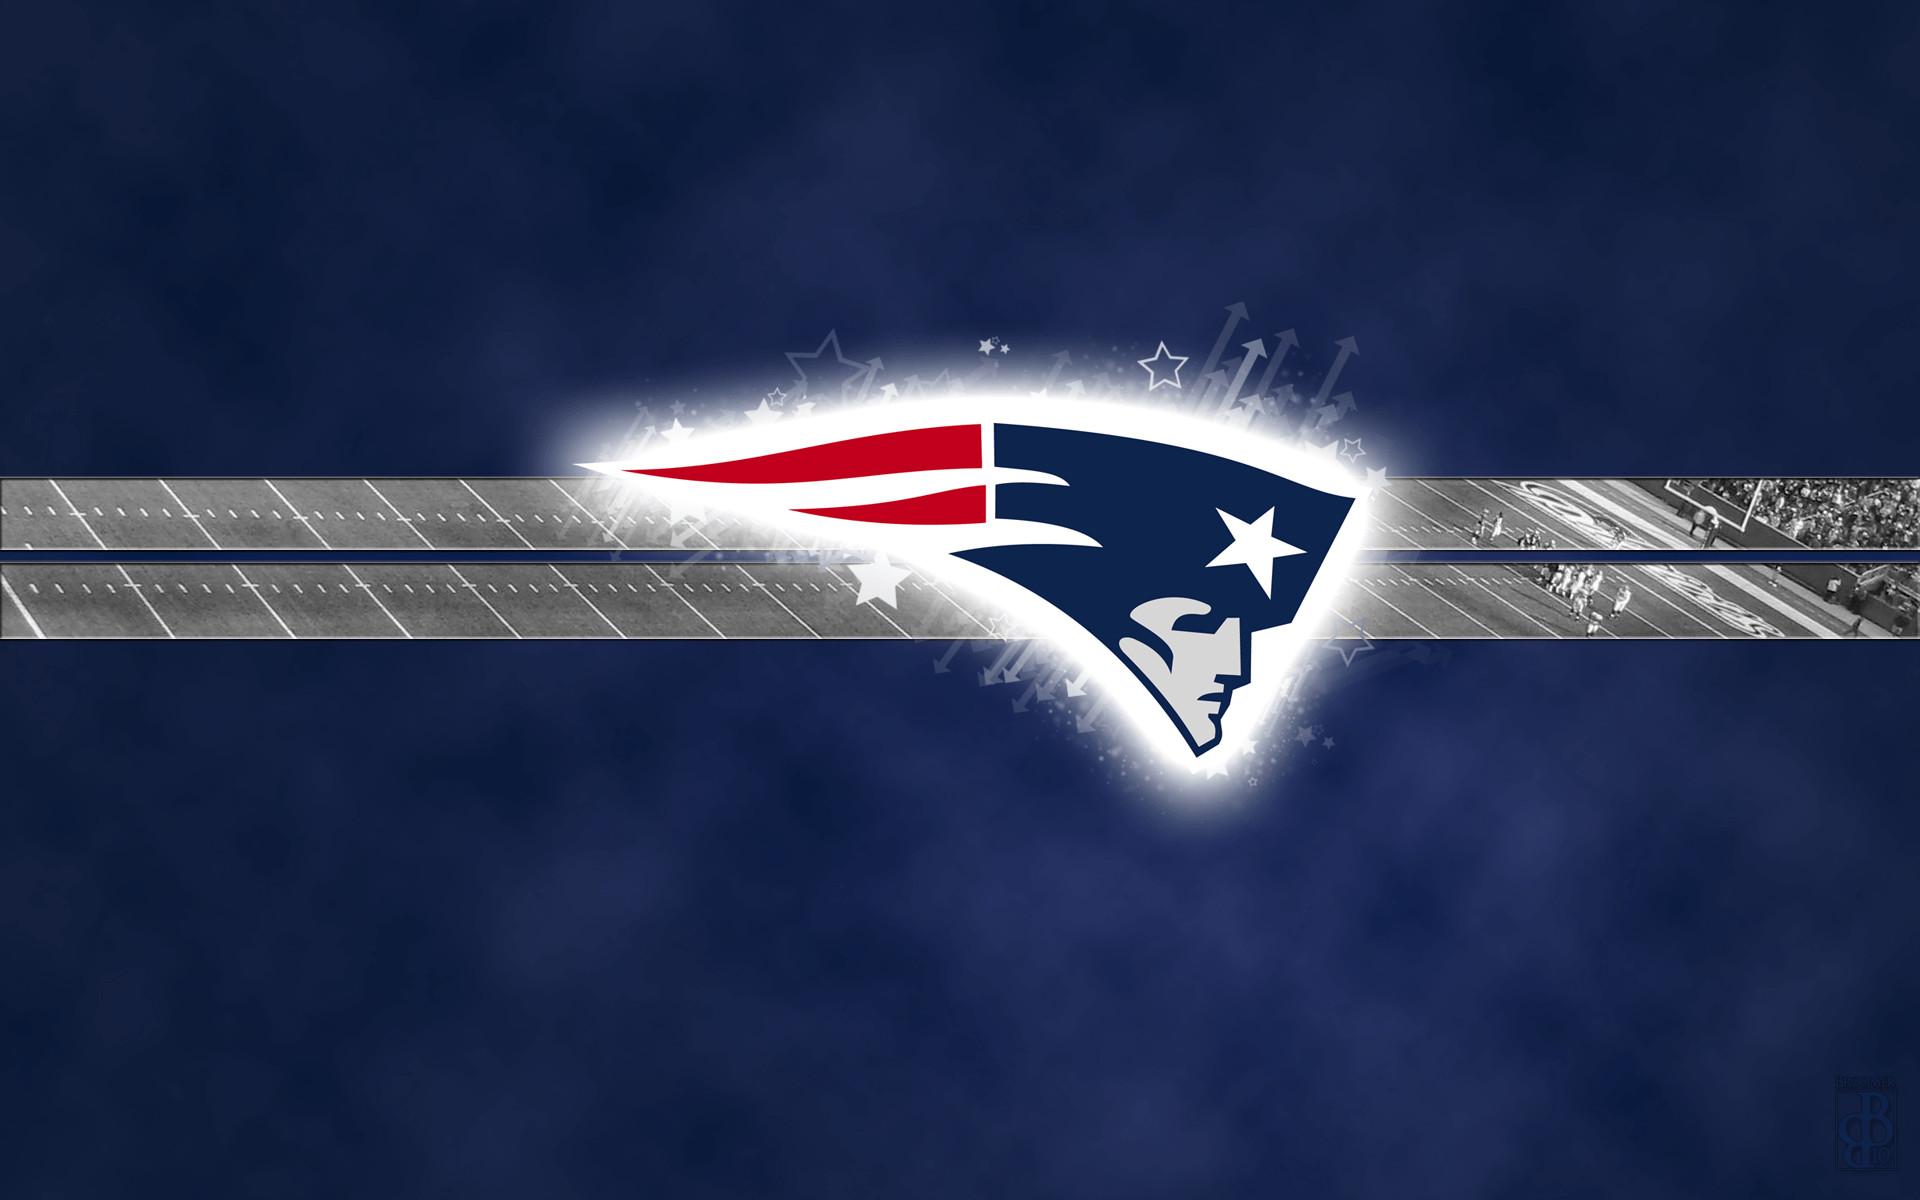 <b>New</b> York Giants Super Bowl XLVI Champions <b